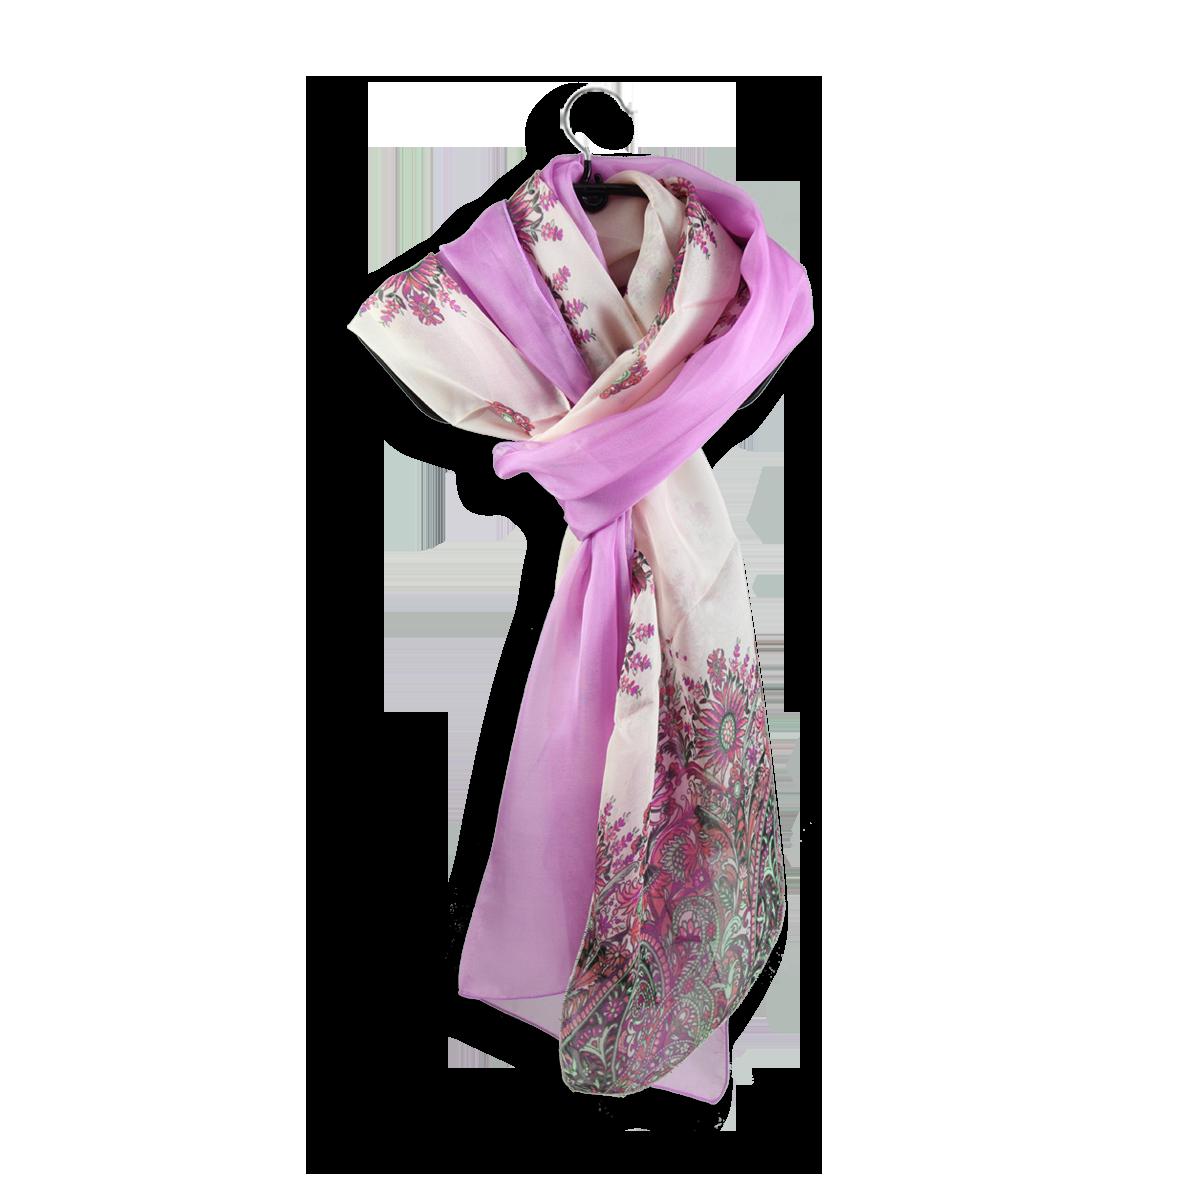 Echarpe Femme DUO en soie - Echarpe motif cachemire Rose Fuchsia 003f007b208